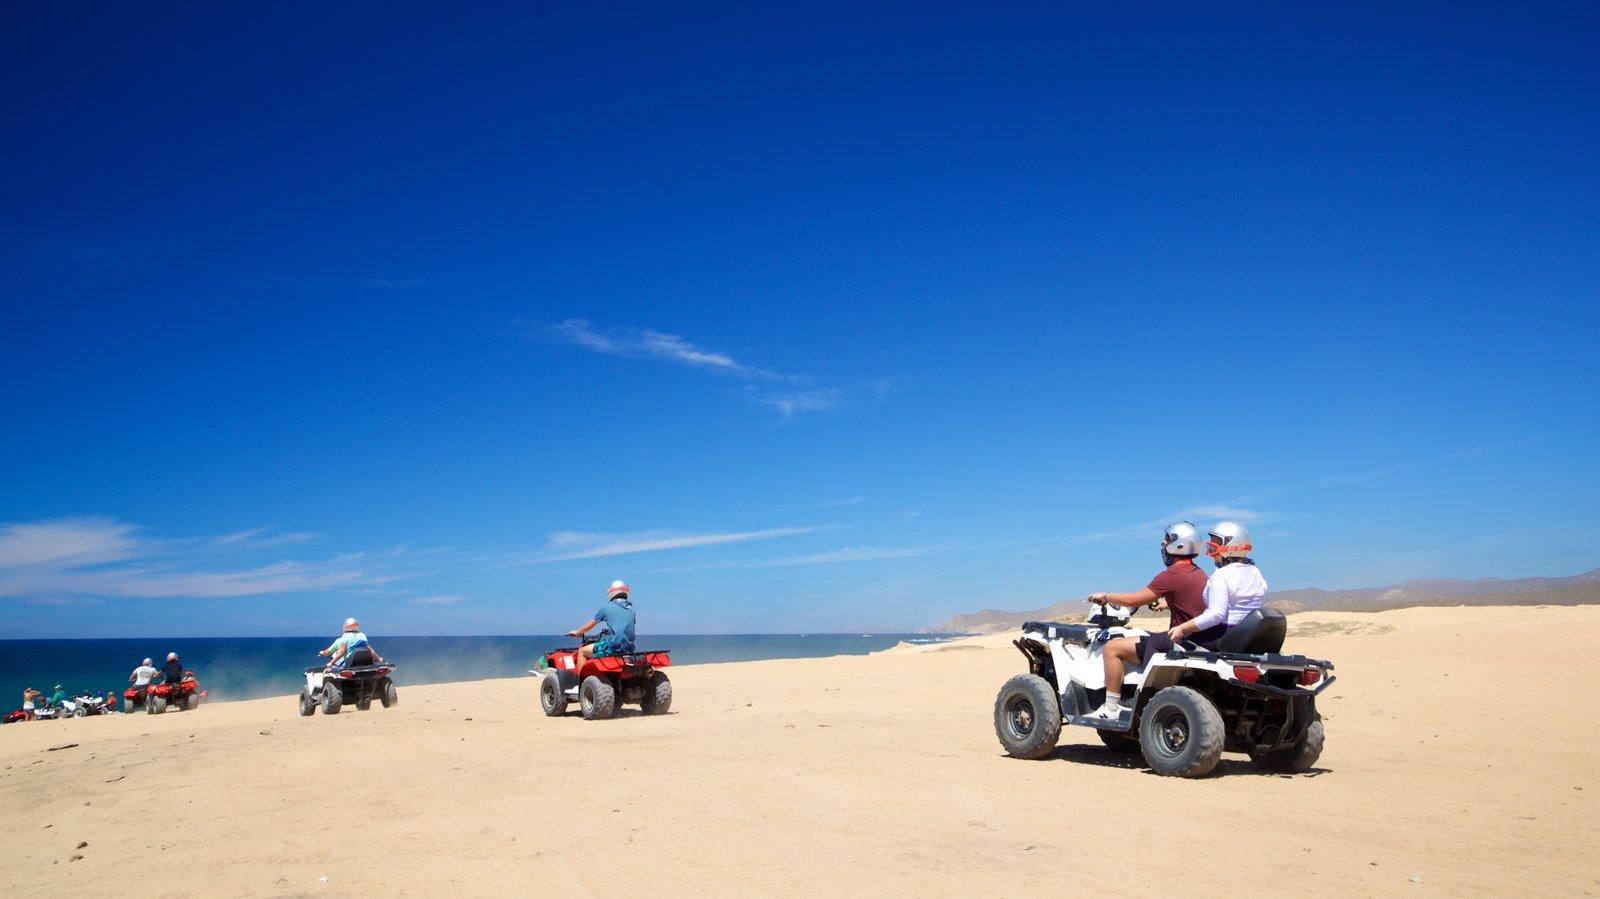 Migrino featuring a sandy beach, 4 wheel driving and general coastal views